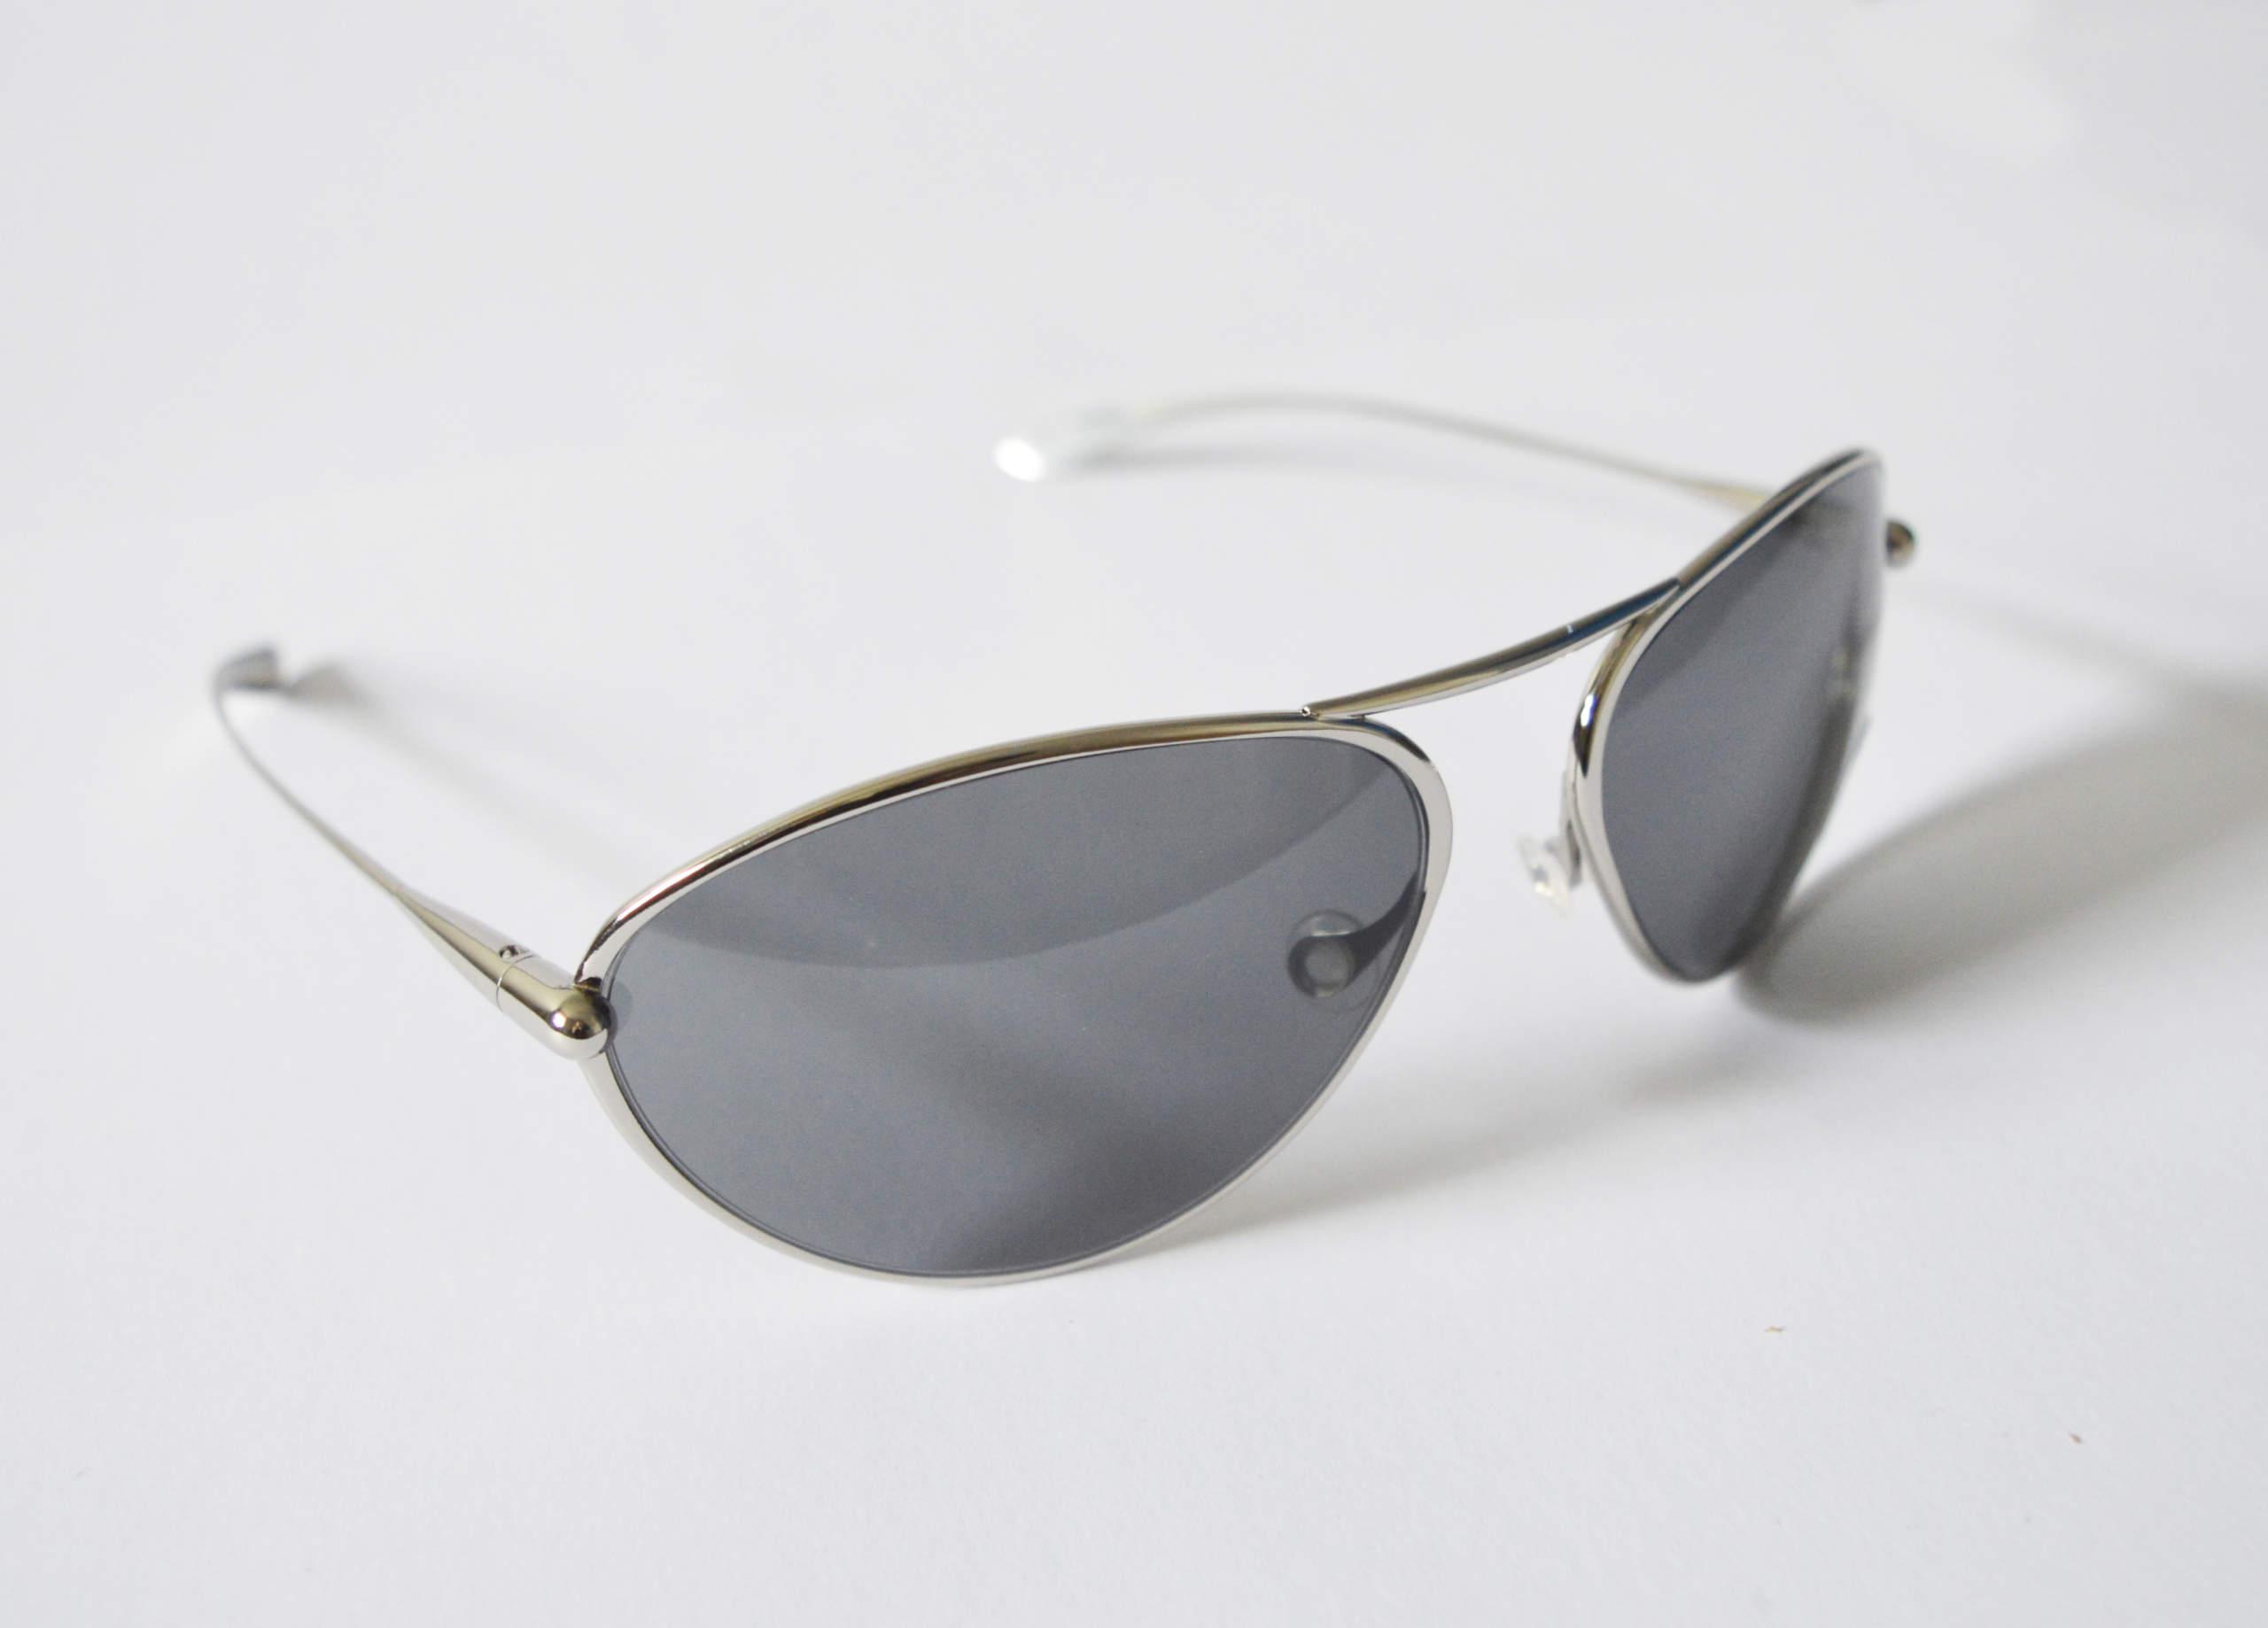 Tropo - Polished Titanium Frame High-Contrast Sunglasses